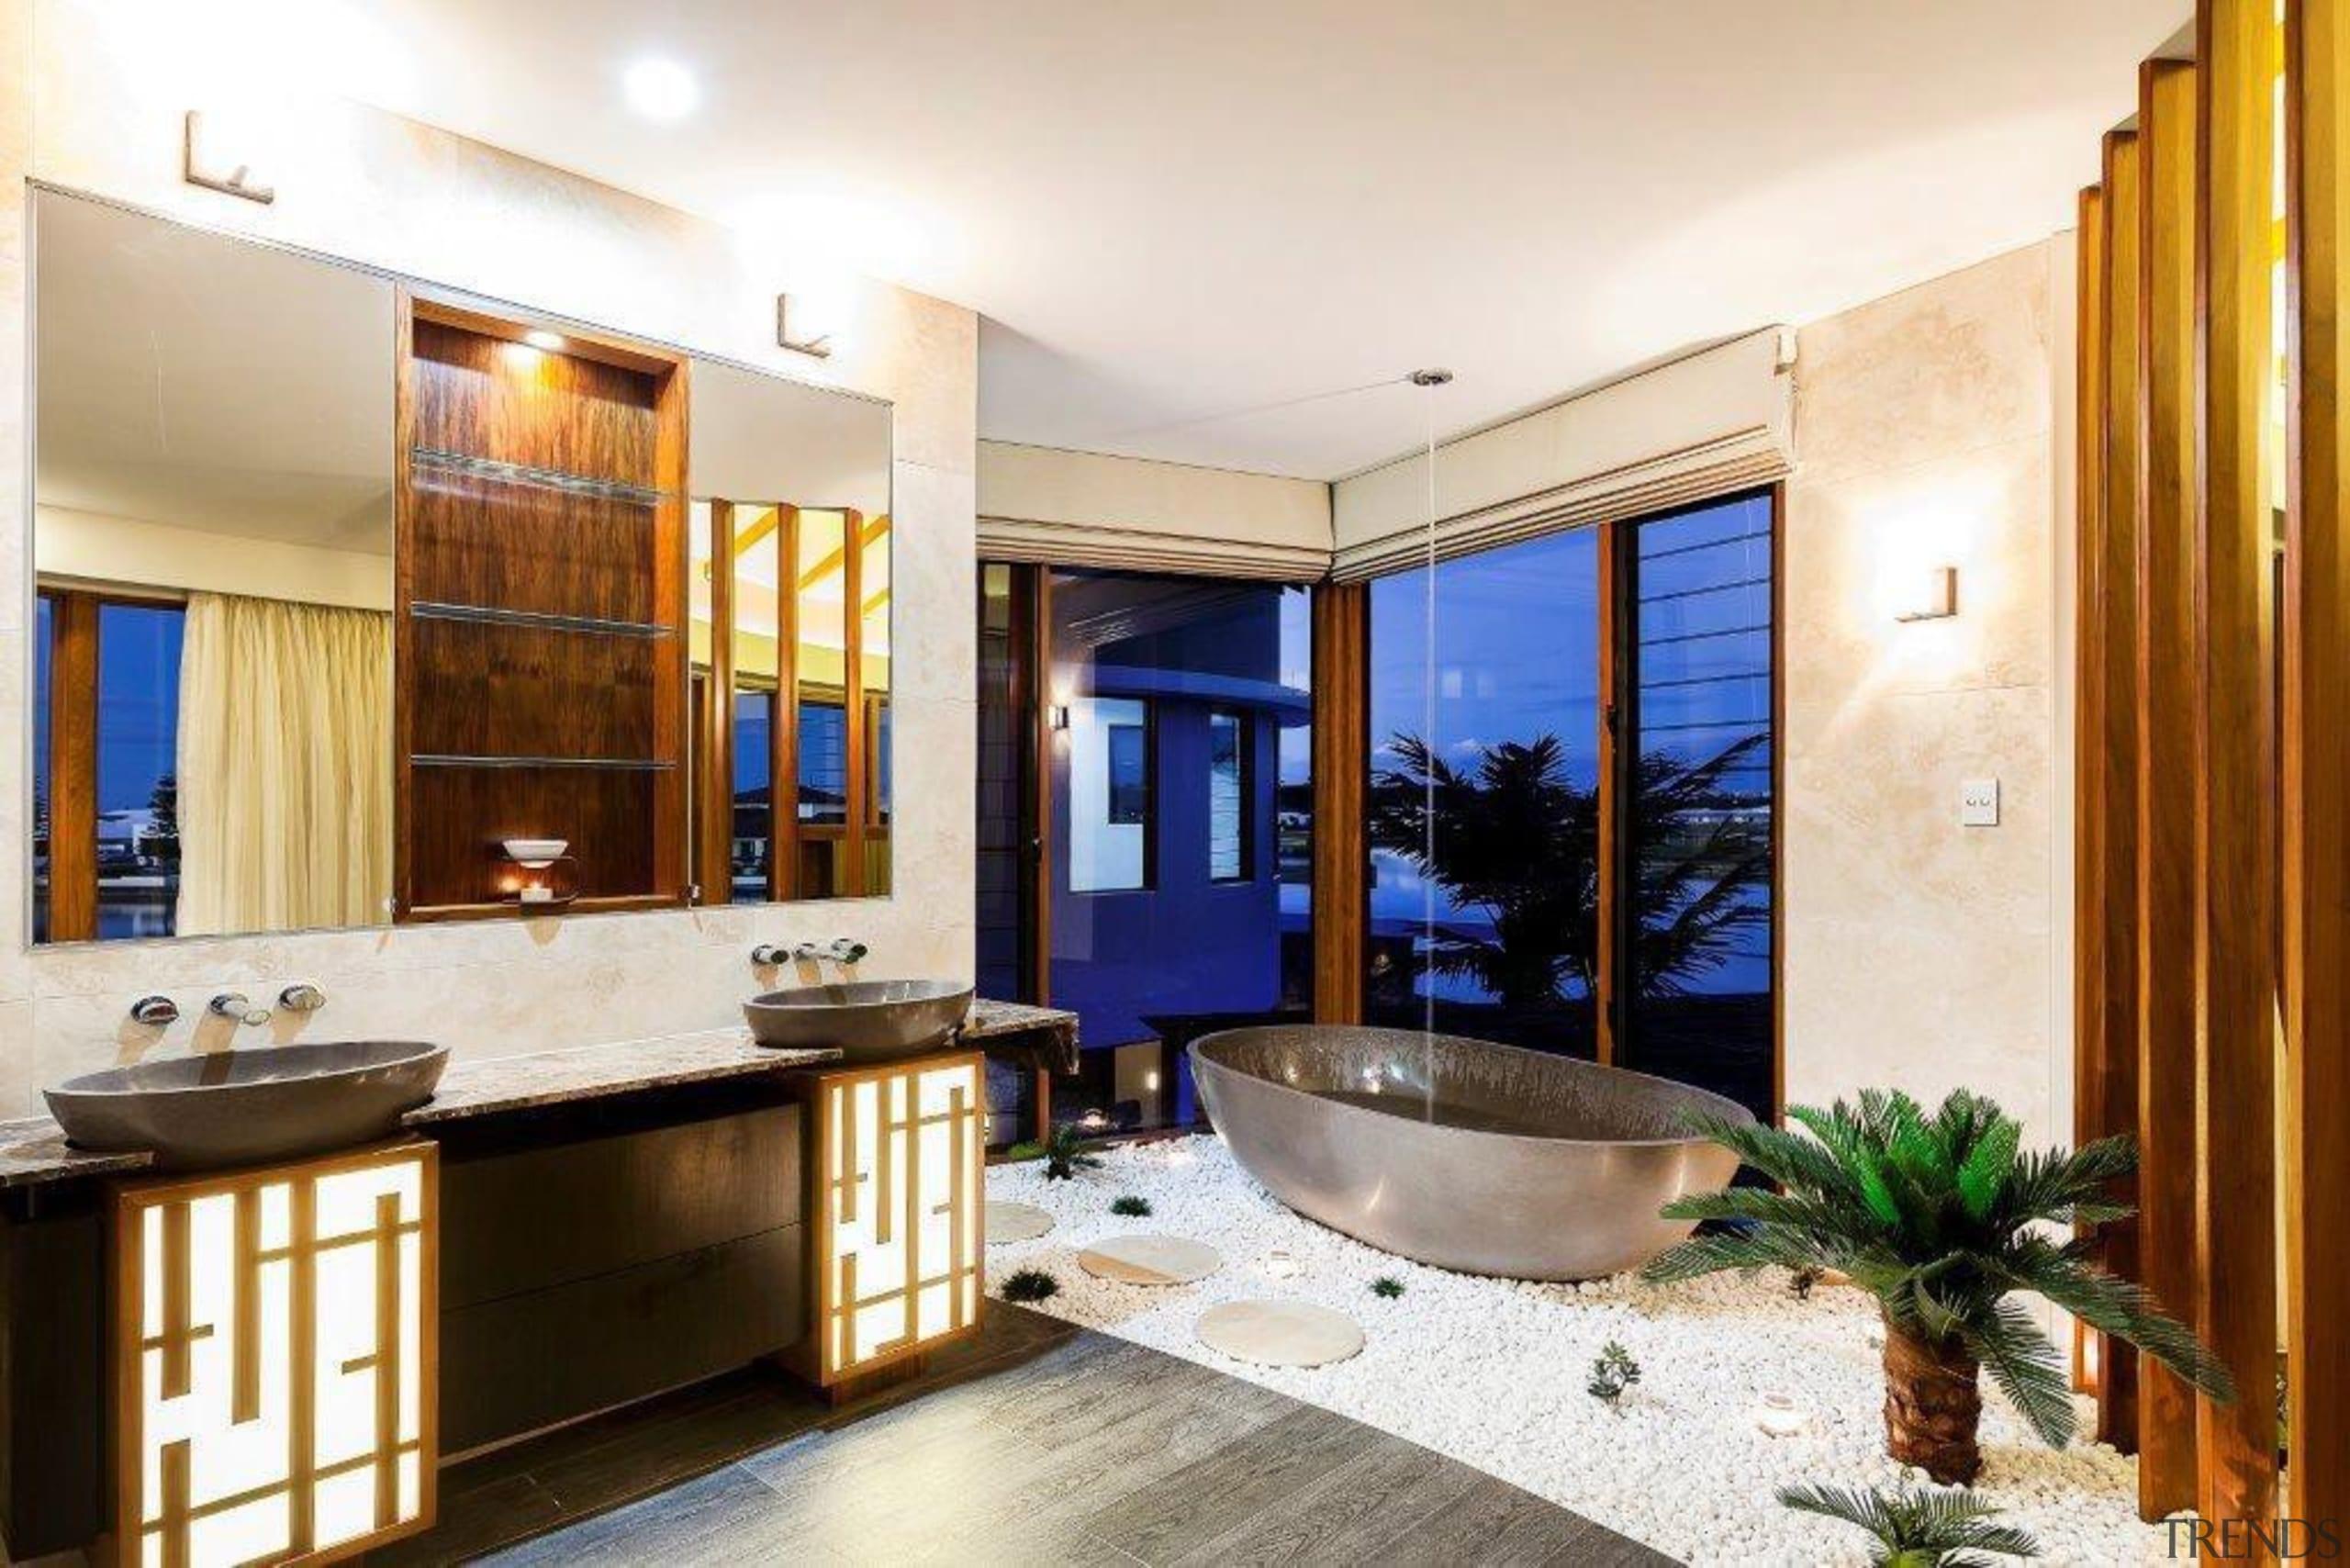 Winner Bathroom of the Year Queensland 2013 by bathroom, countertop, estate, interior design, property, real estate, room, white, brown